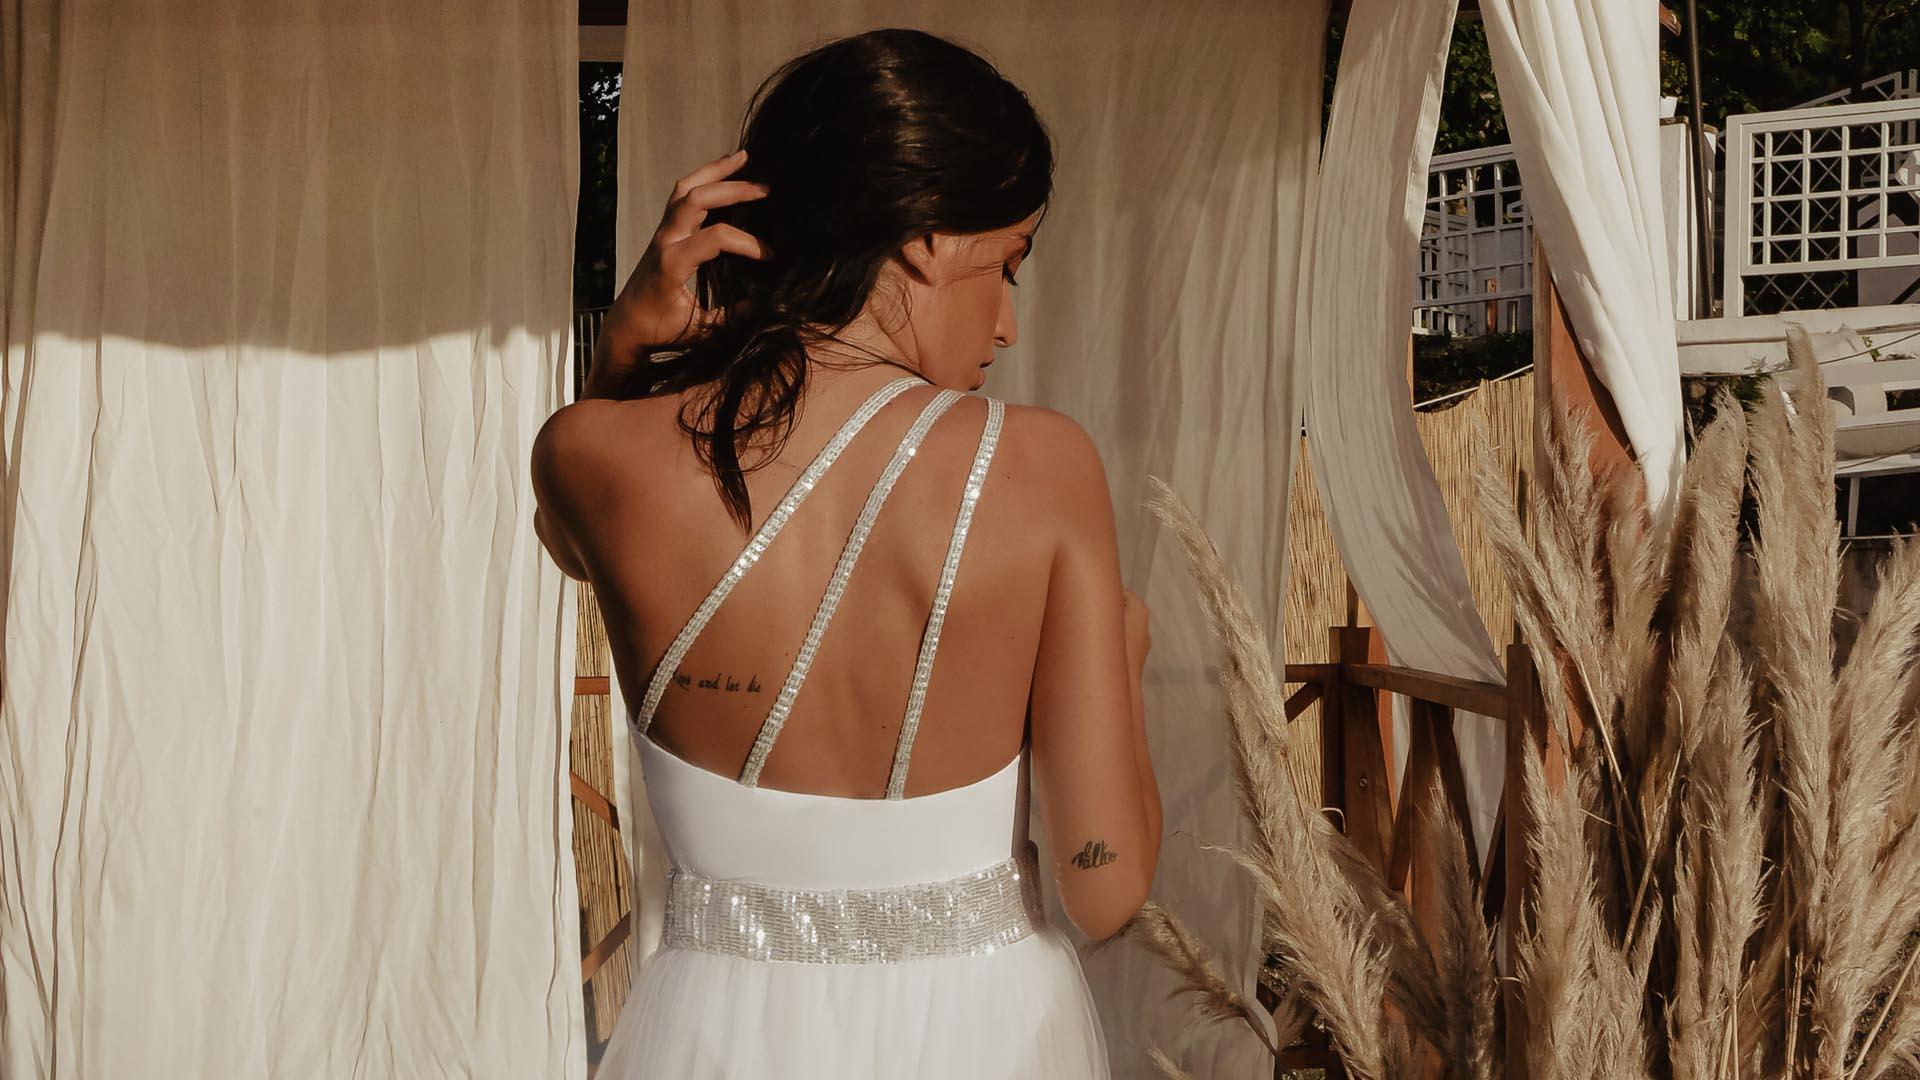 Étoile costume monospalla bianco